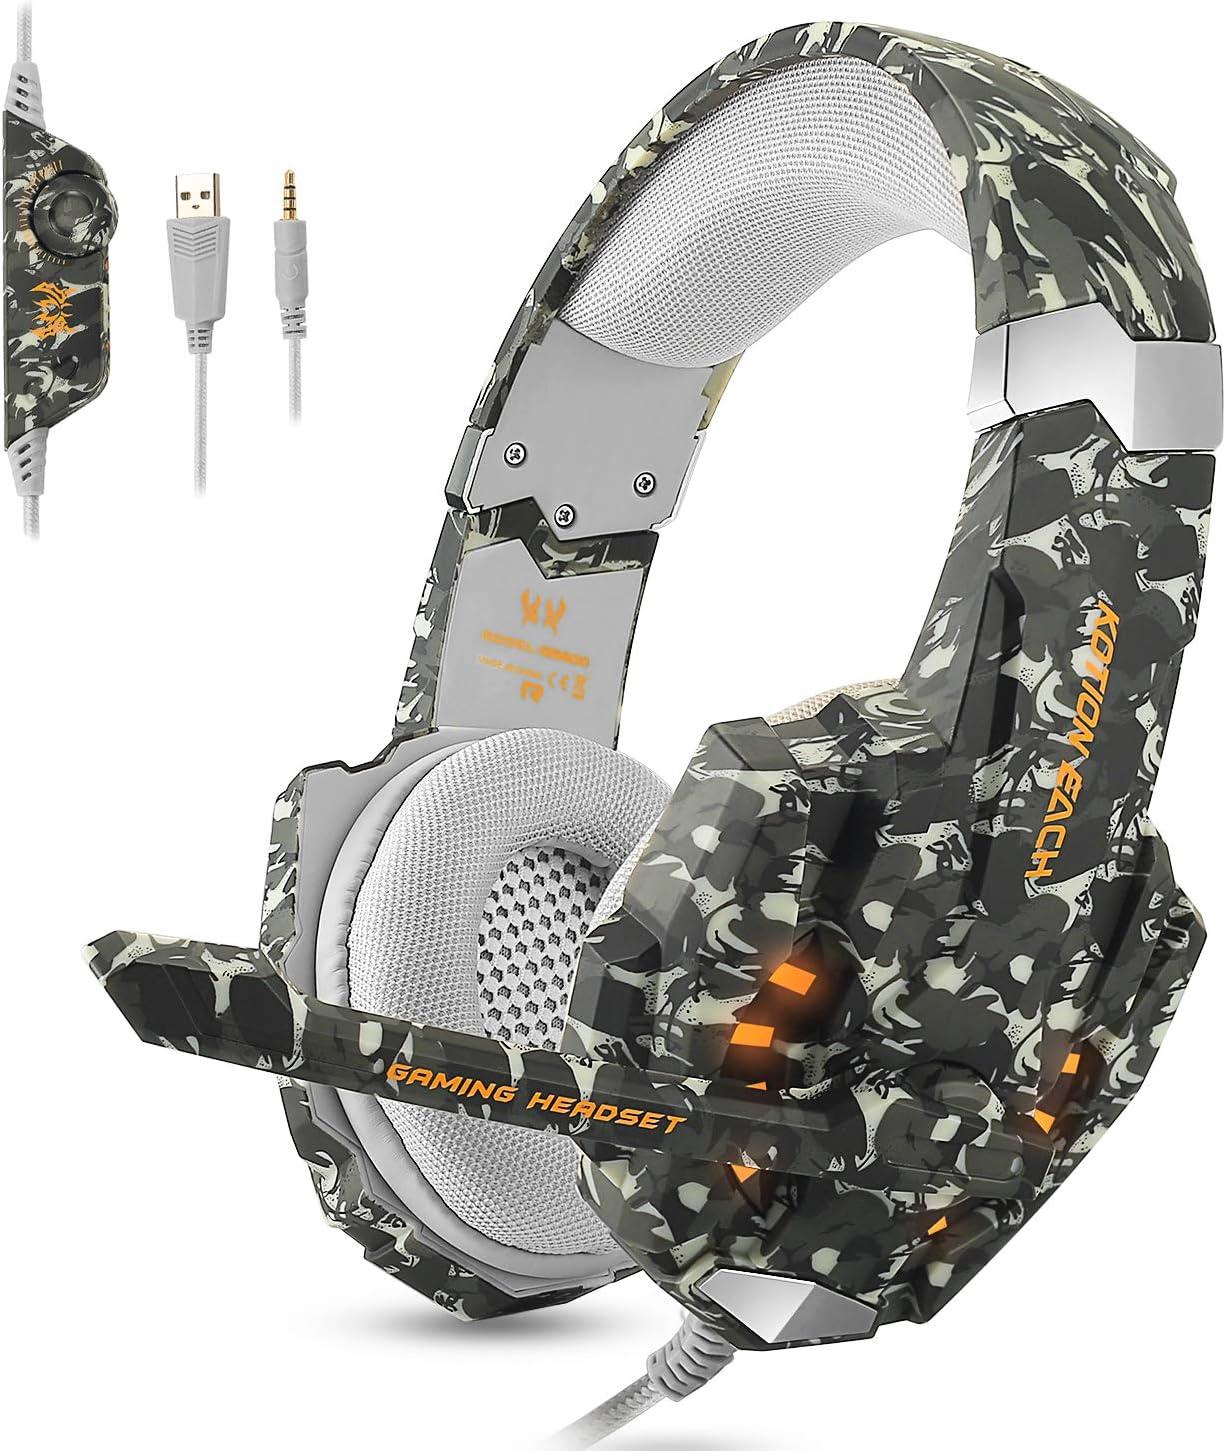 Gaming Headset per PS4 PC Xbox, Cuffia da Gaming con microfono, Luce a LED & Stereo Bass Surrounding per Mac Xbox One Tablet Laptop(Camo)